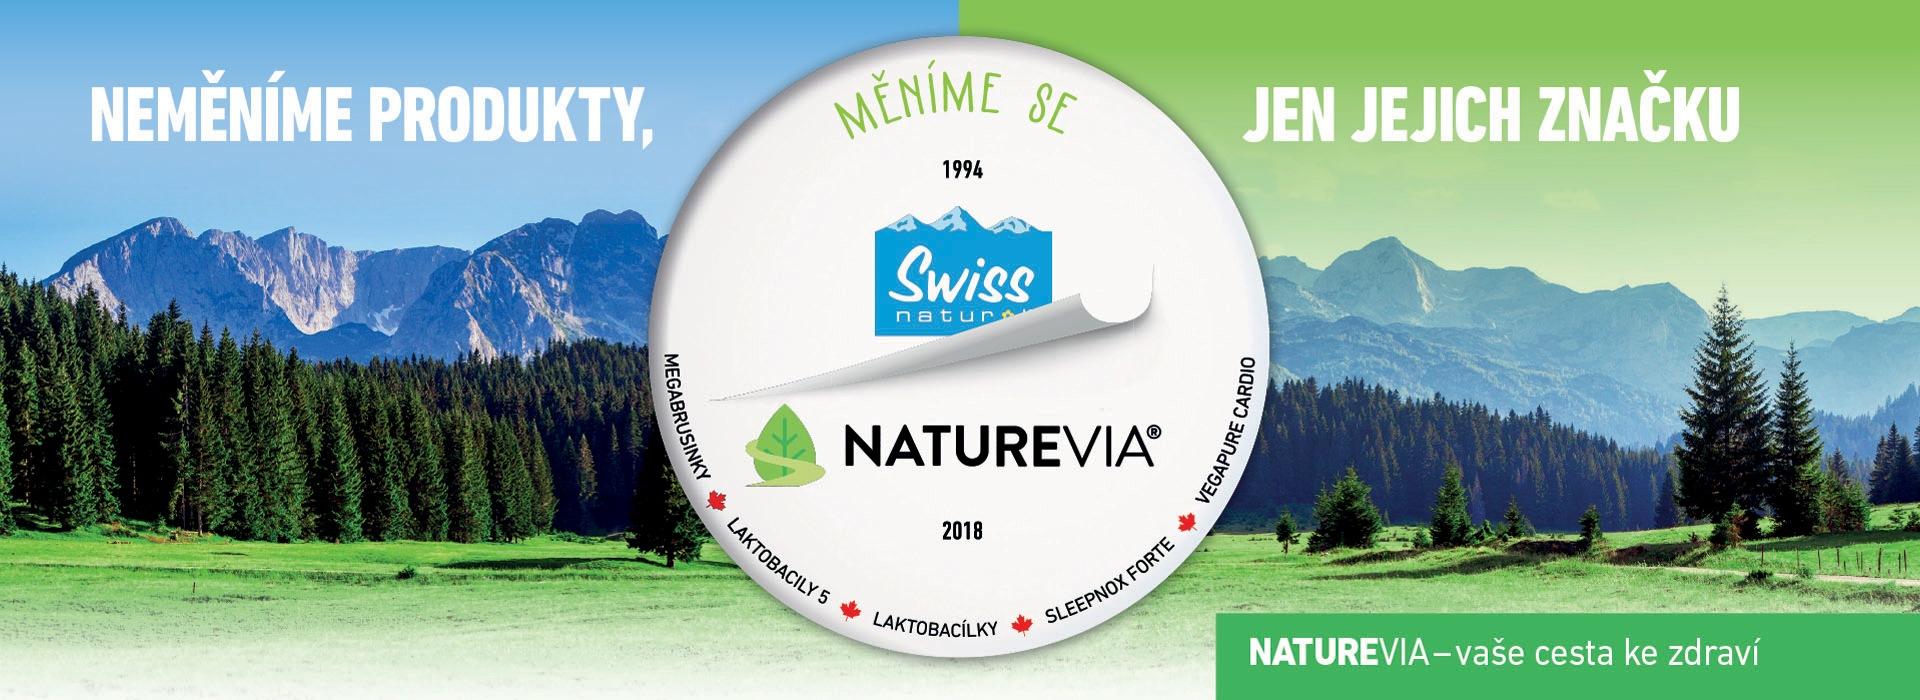 Naturevia slide 1